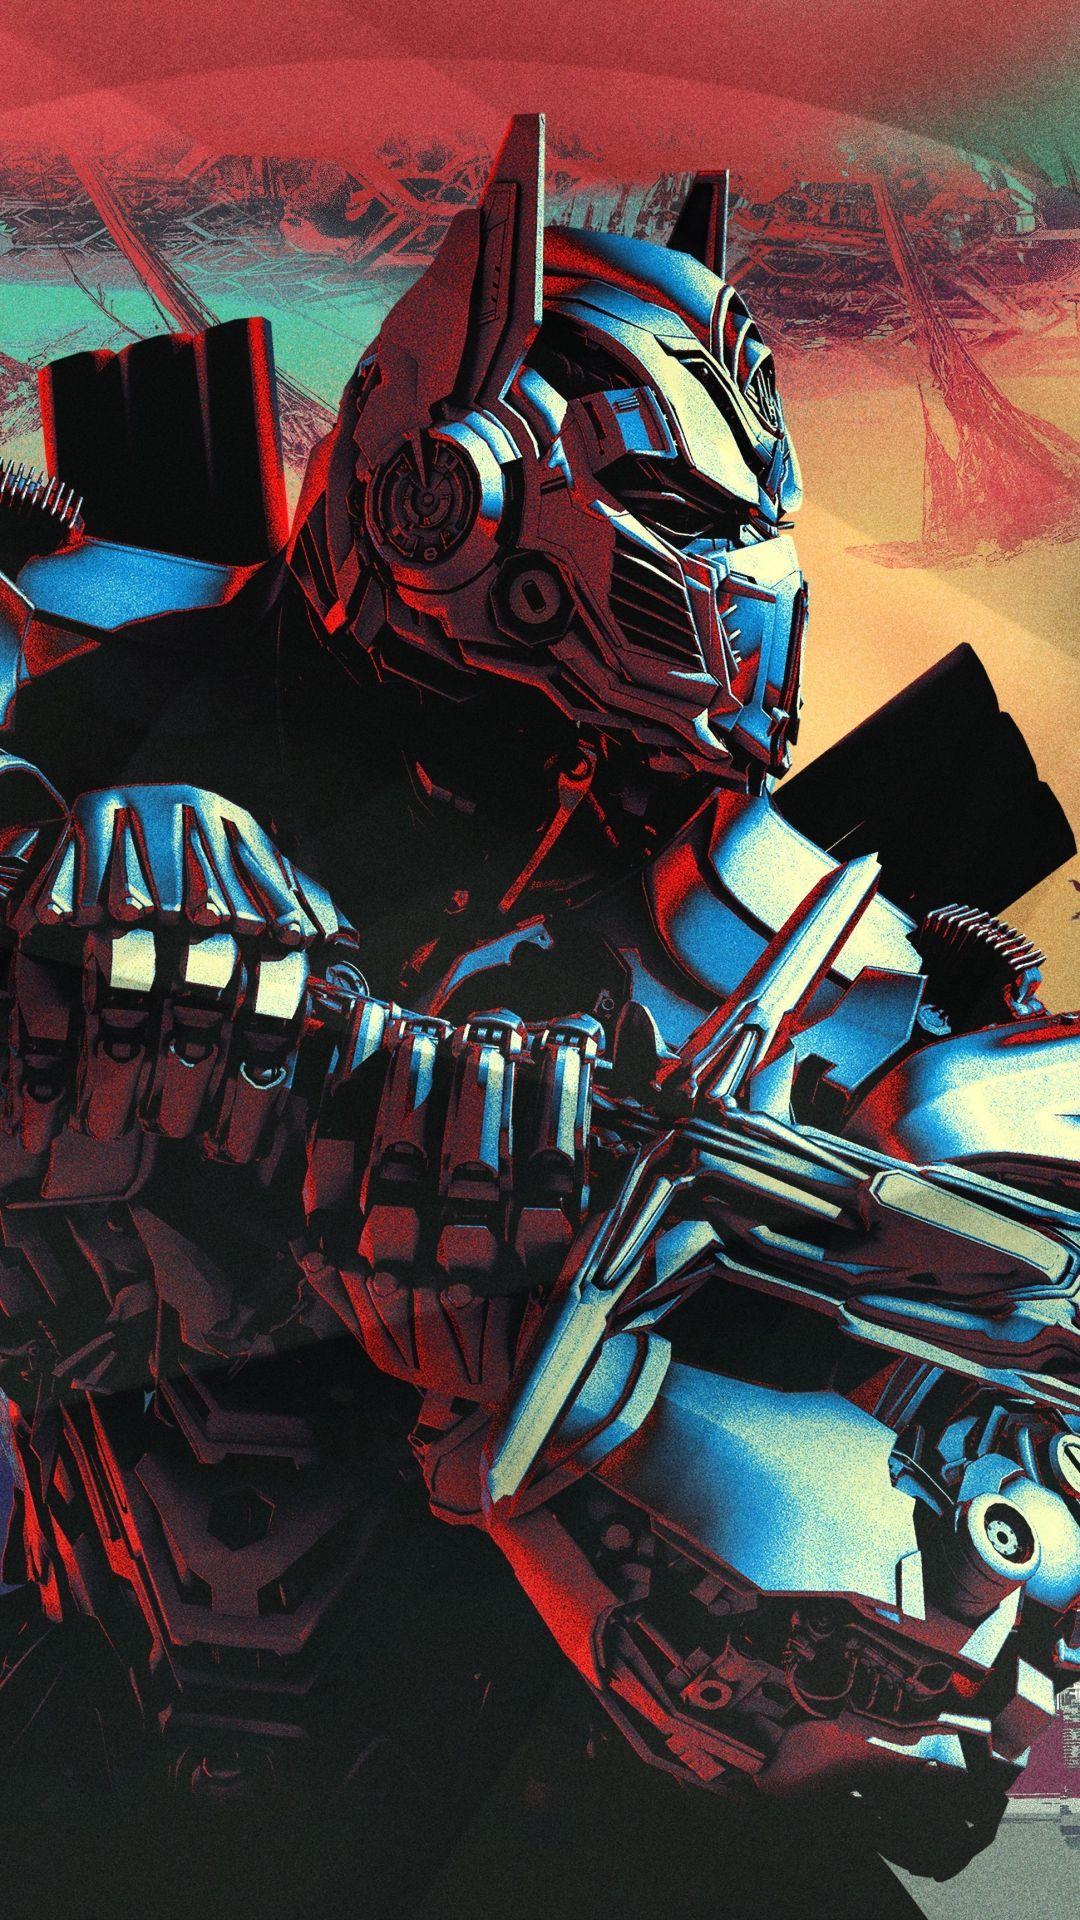 Transformers optimus prime iphone wallpapers top free - Transformers prime wallpaper ...